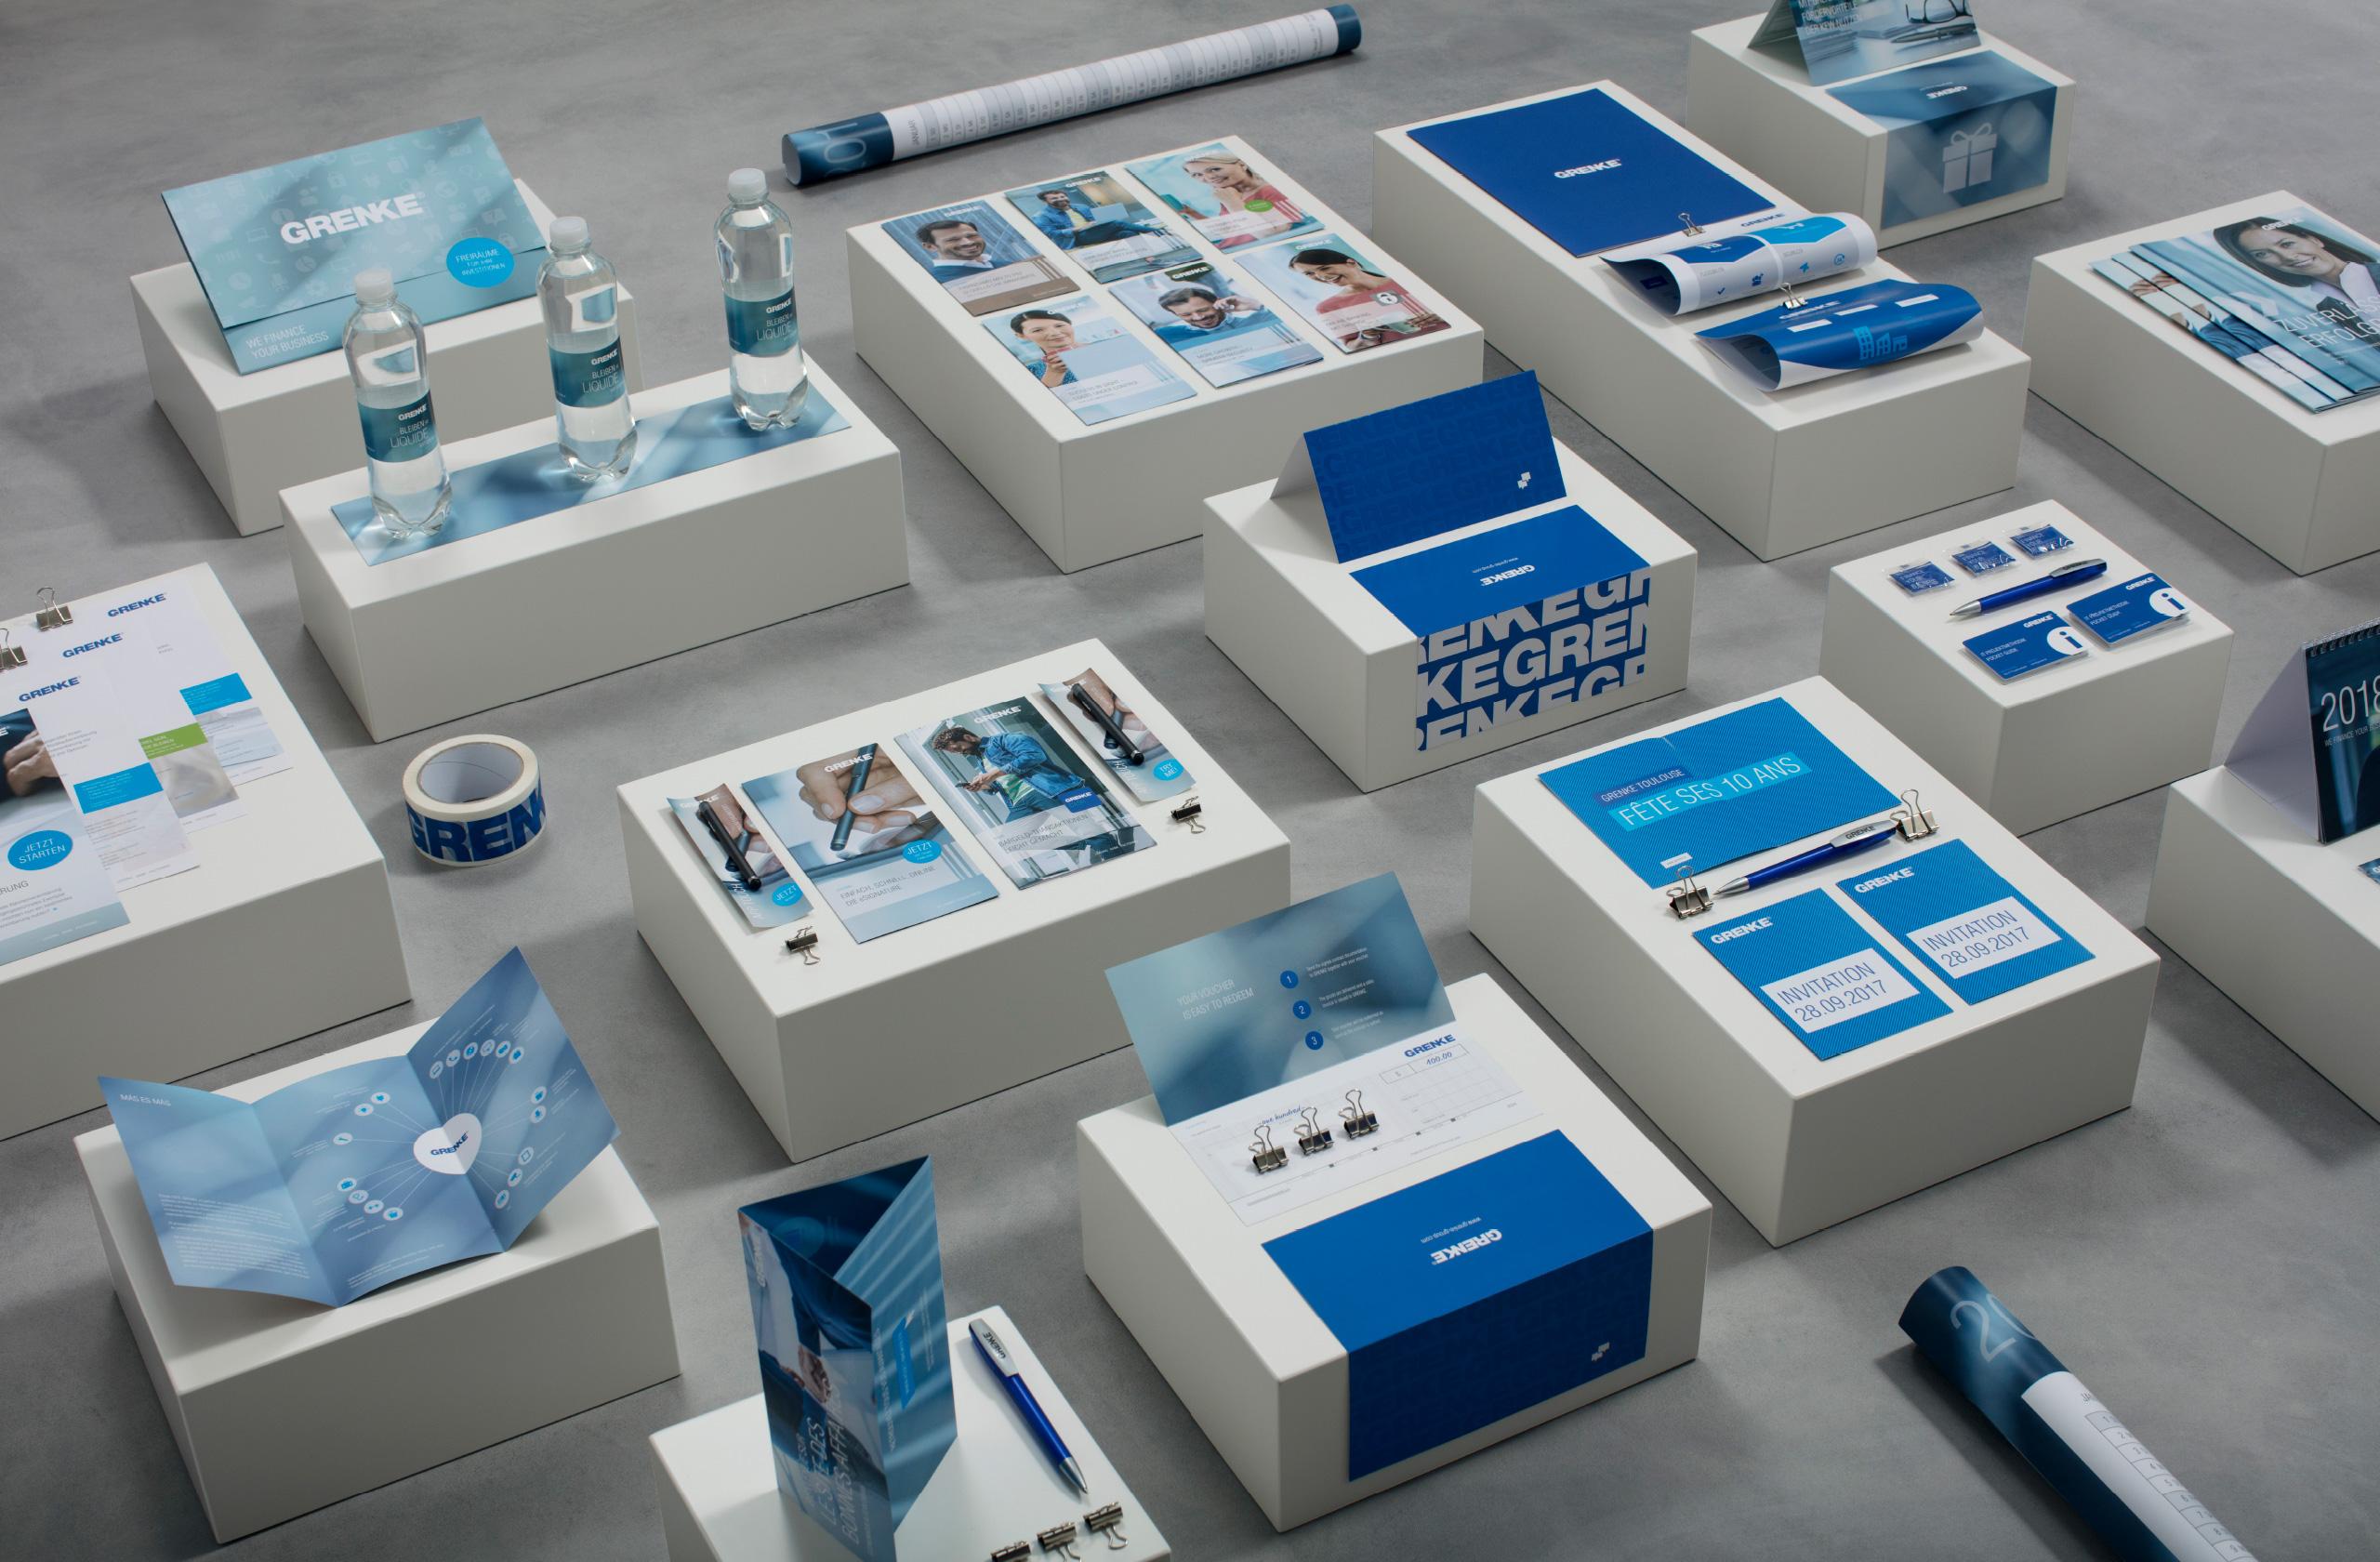 Bourdonné Design Grenke Bestellung